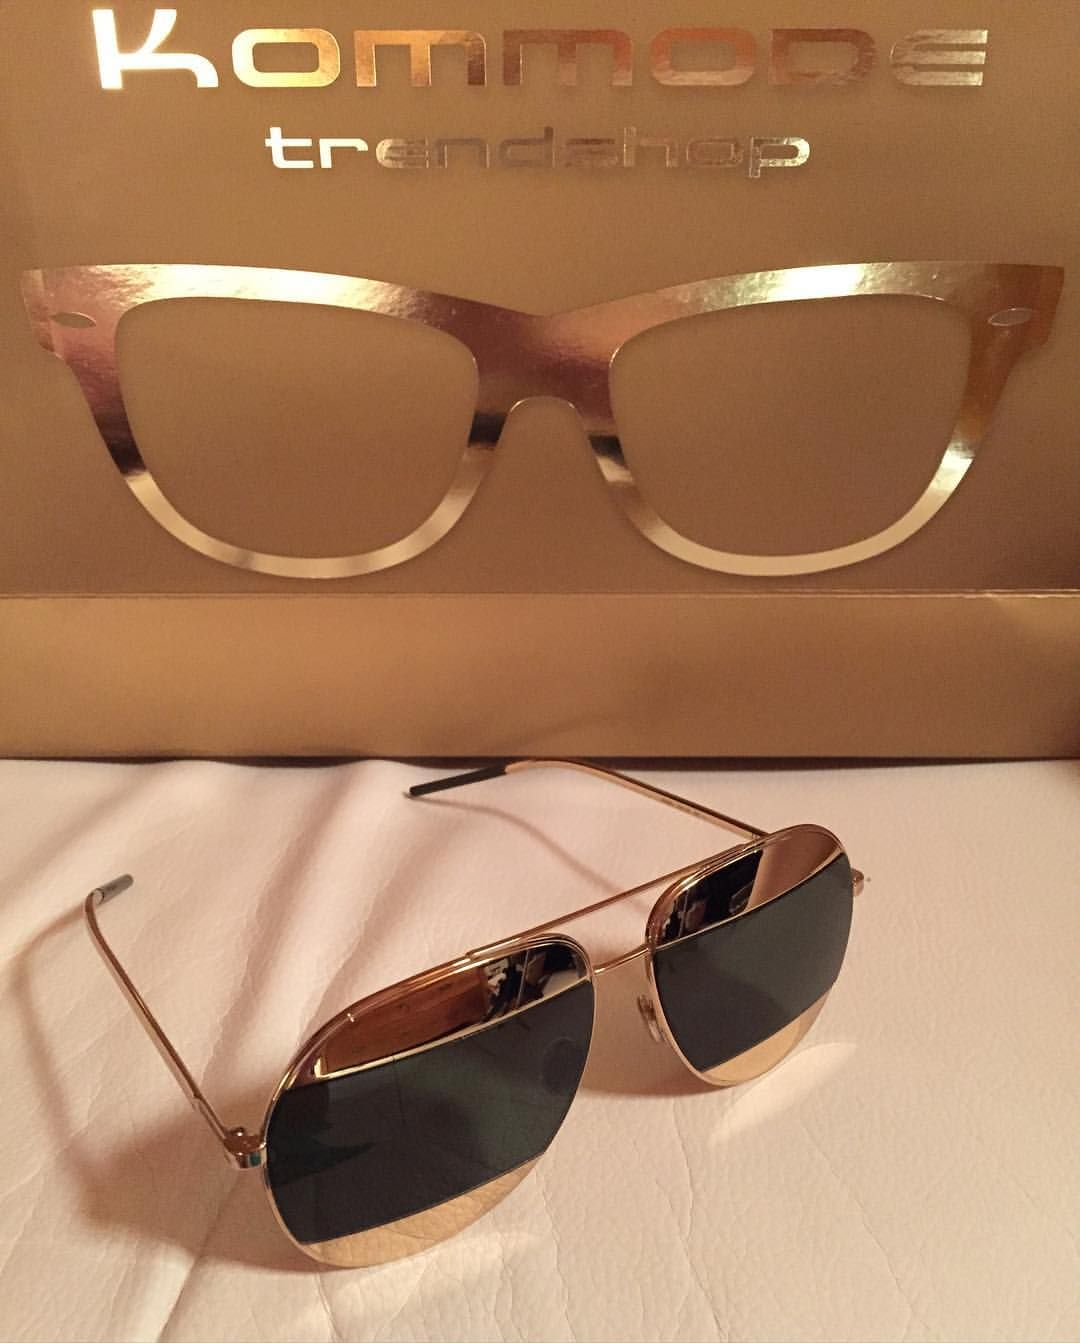 I  my new Dior Sunglasses. Thank you @kommode_regensburg #kommoderegensburg #kommodetrendshop #regensburg #bavaria #germany #diorsunglasses #diorsplit #dior #sunnies